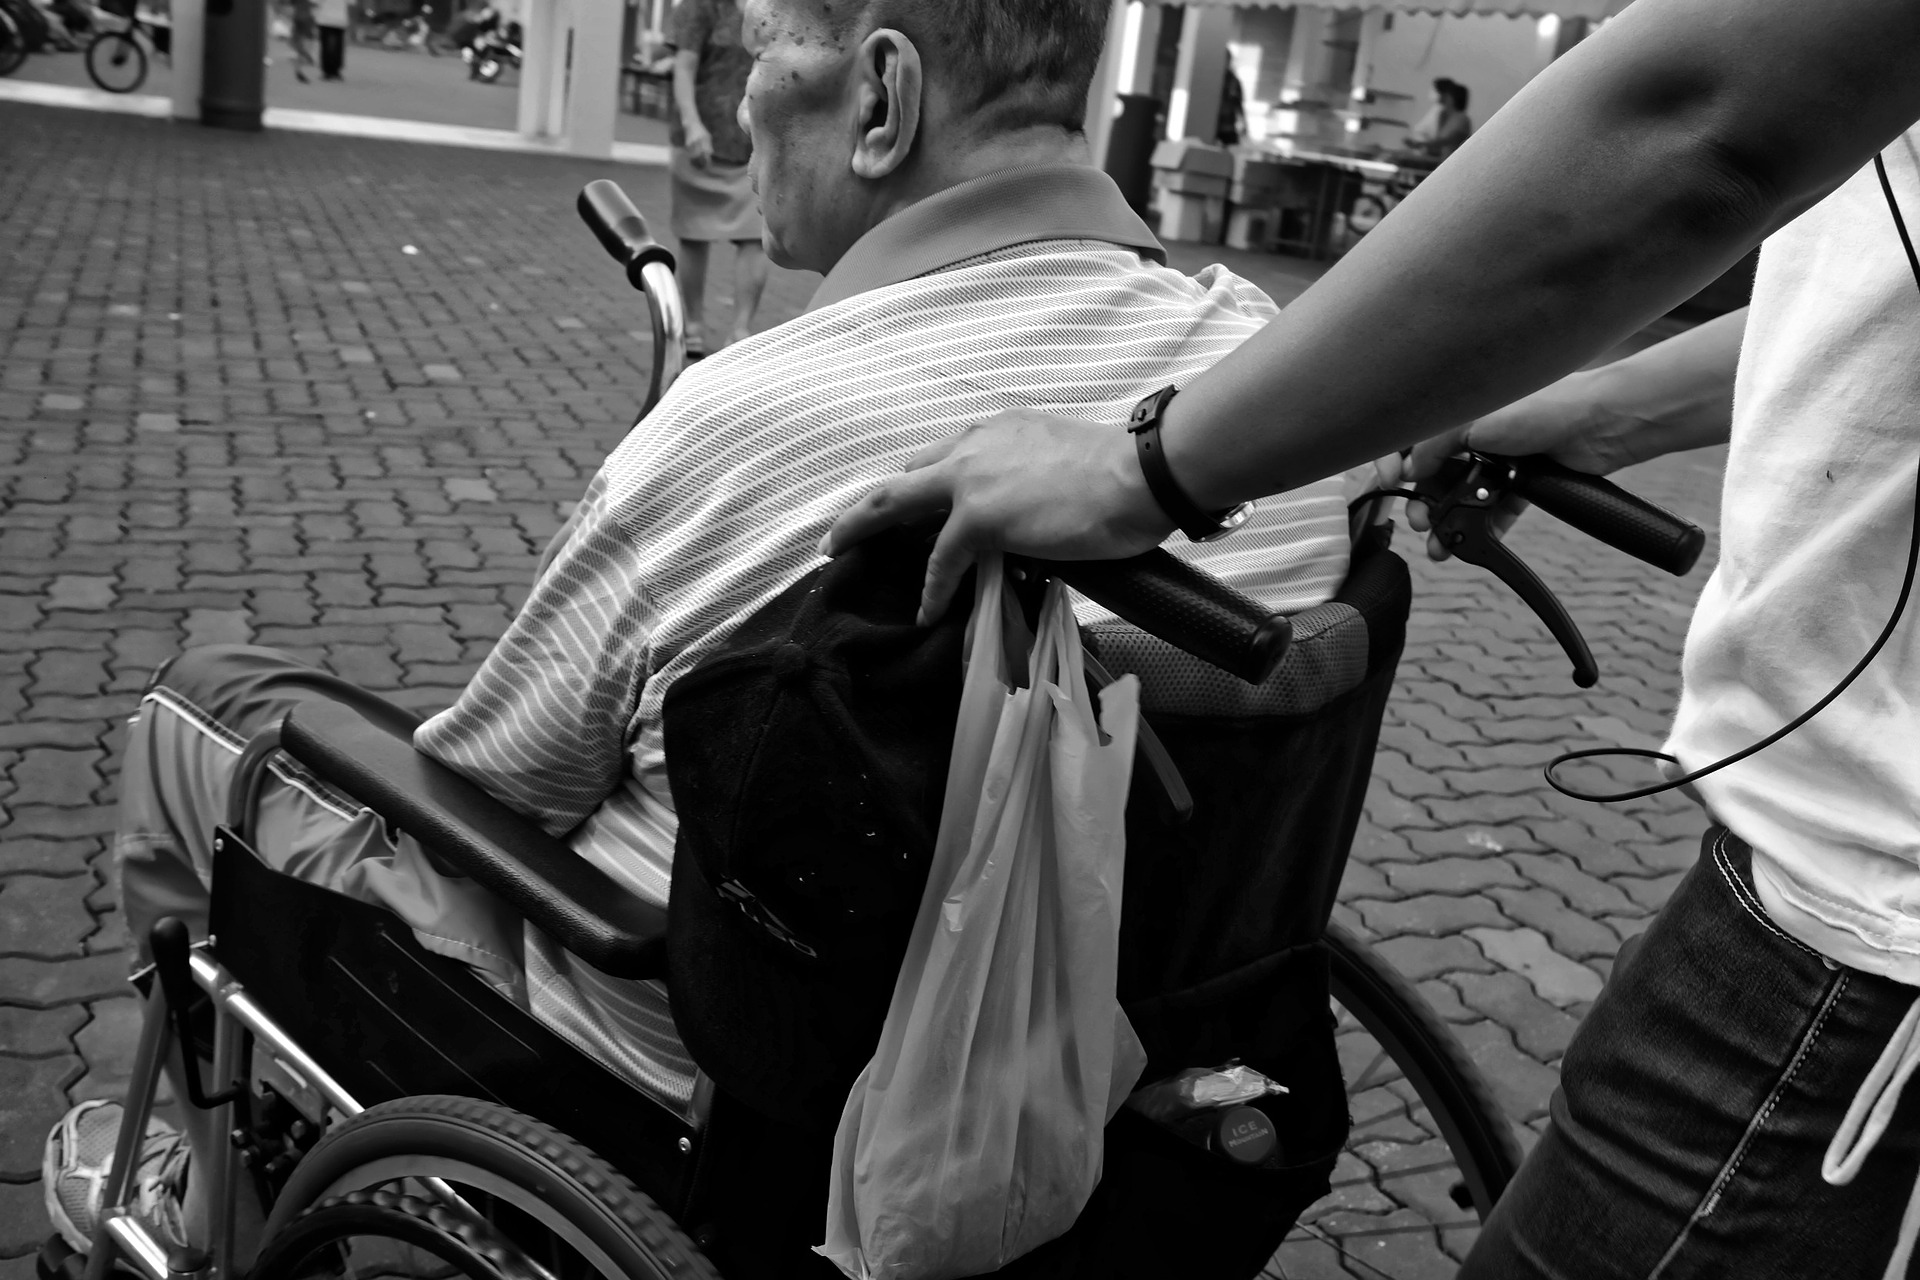 Pedaltrainer Senioren - 10 Pedaltrainer Senioren!